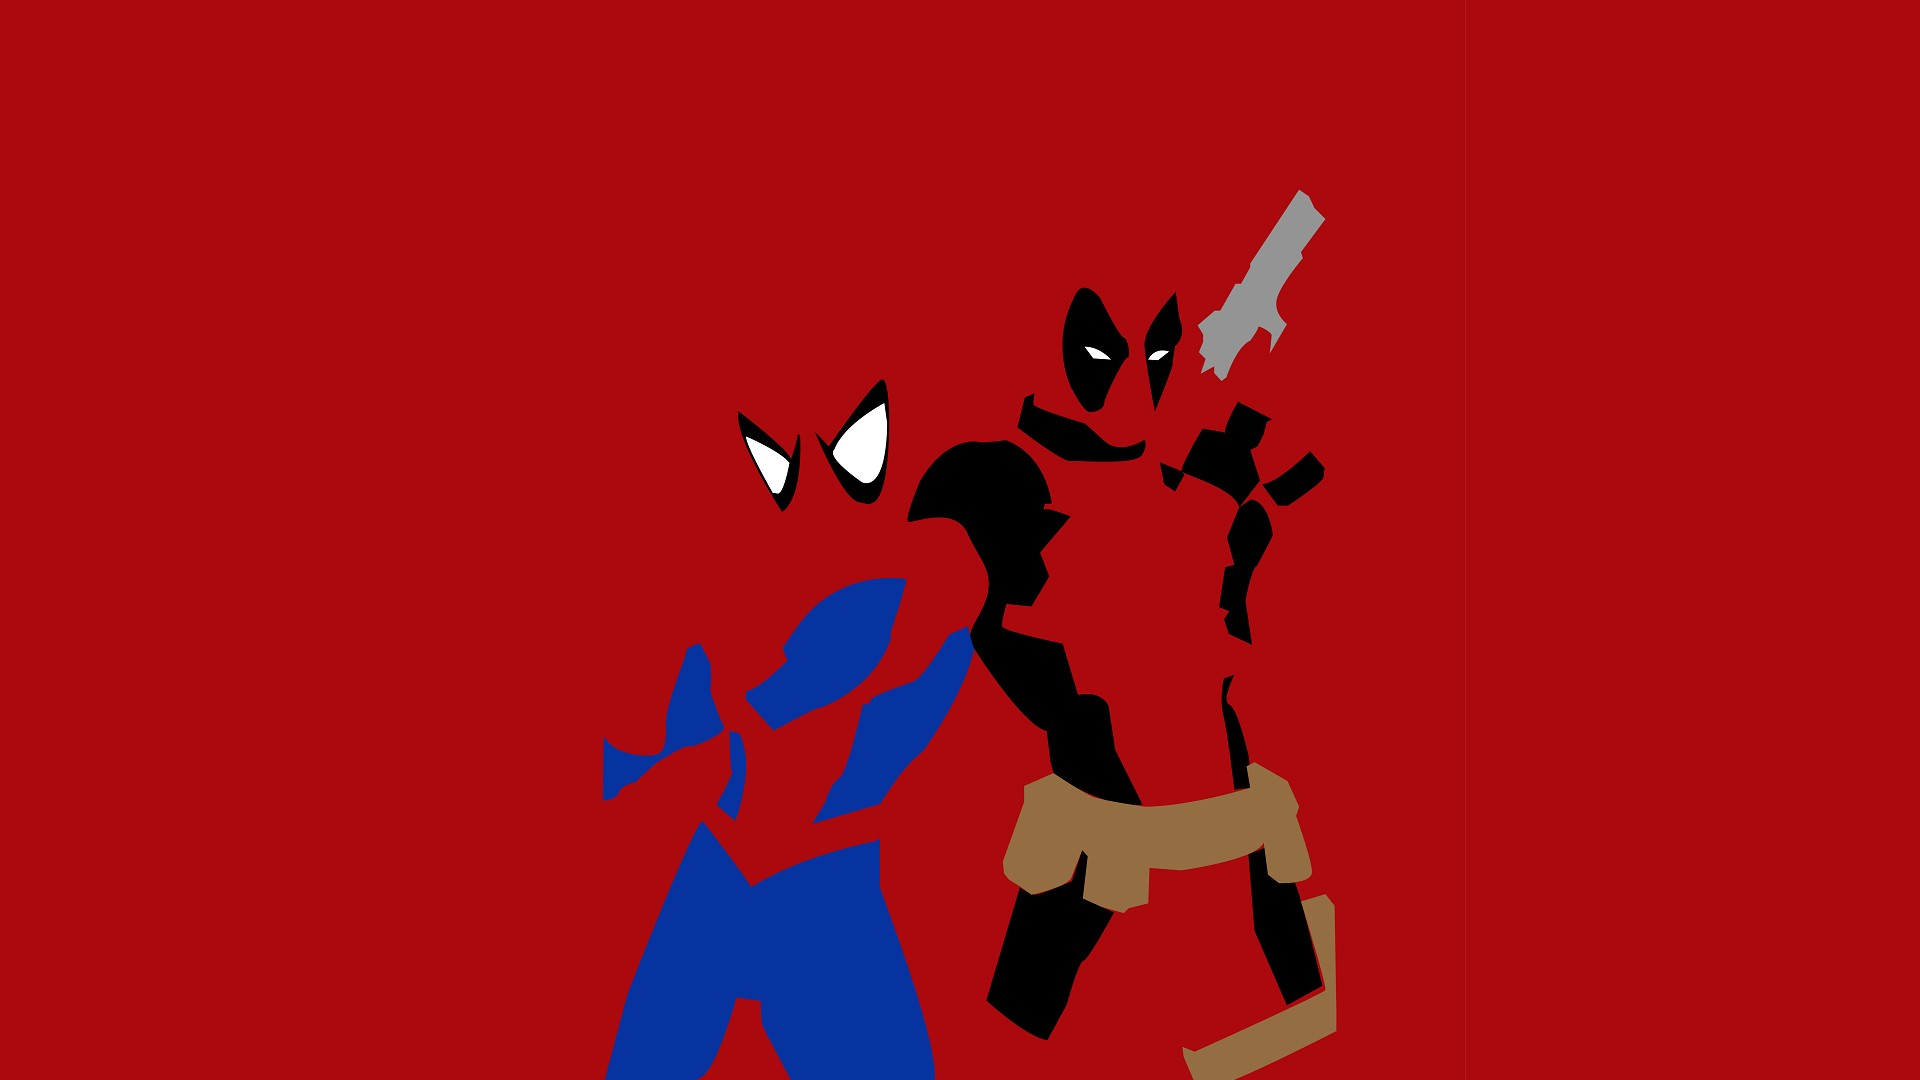 Deadpool and Spider Man Wallpapers - WallpaperSafari